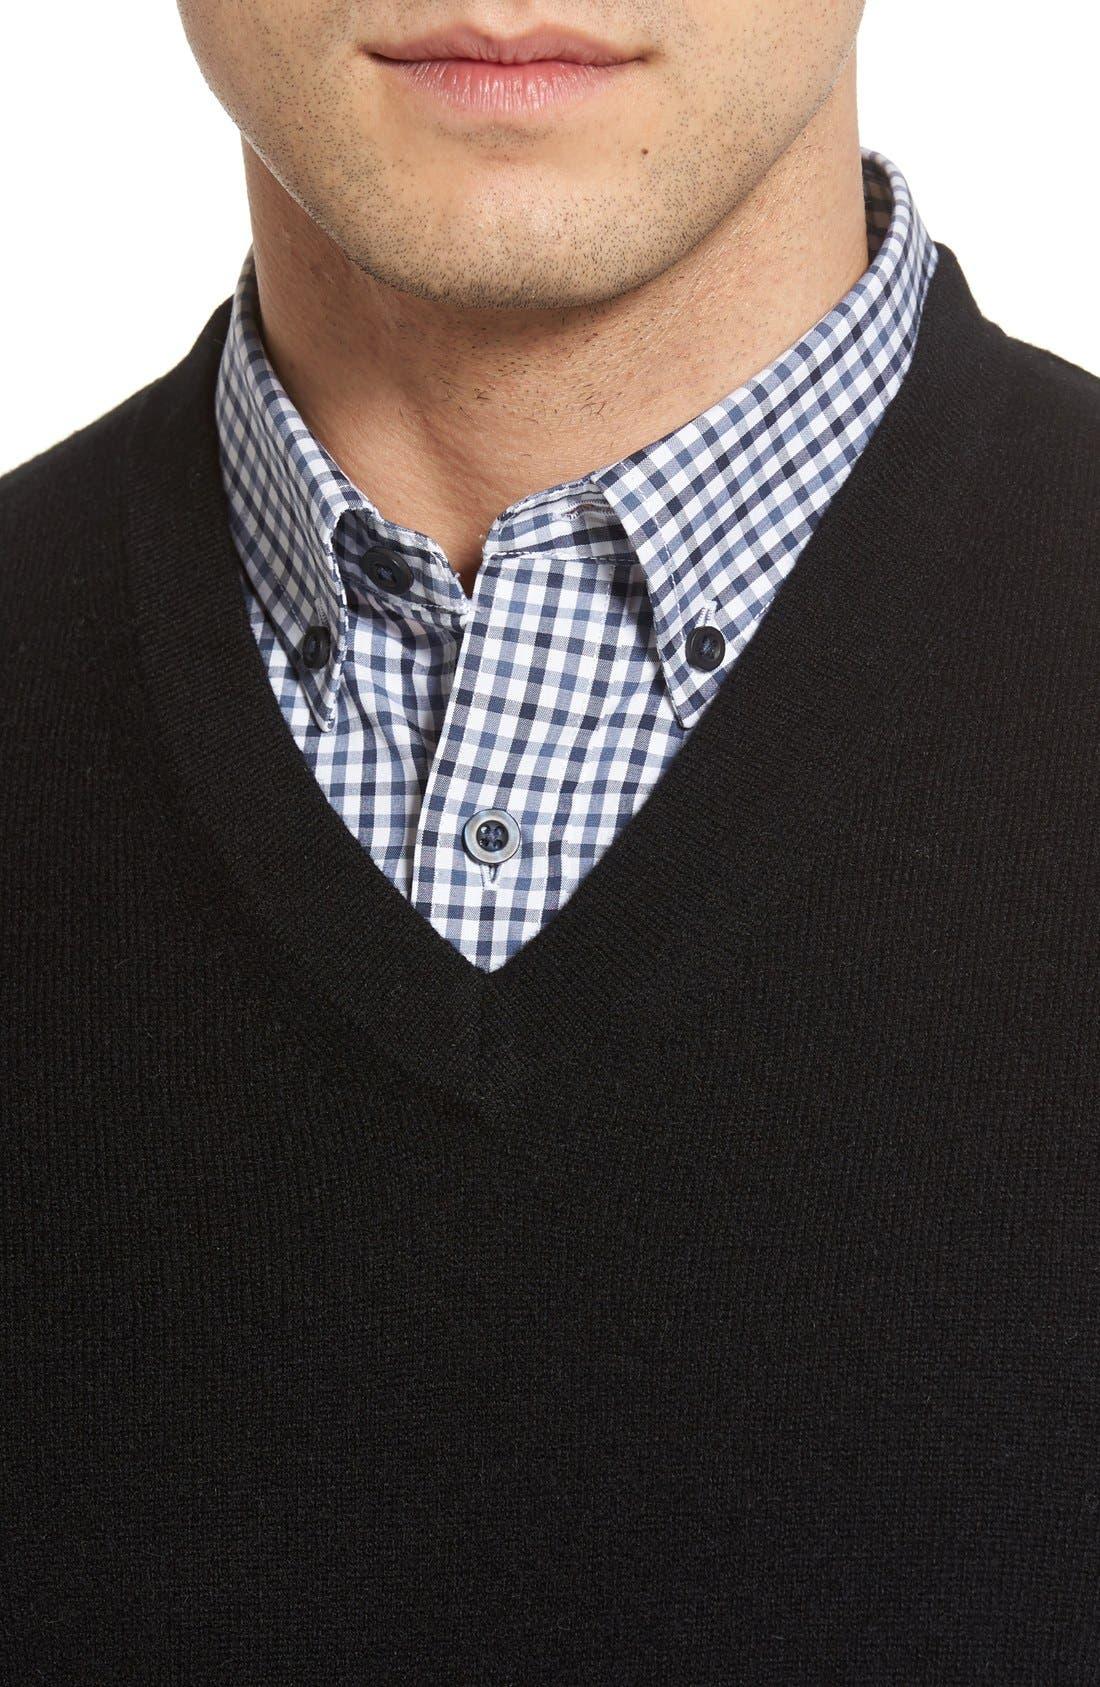 Cashmere V-Neck Sweater Vest,                             Alternate thumbnail 9, color,                             BLACK CAVIAR